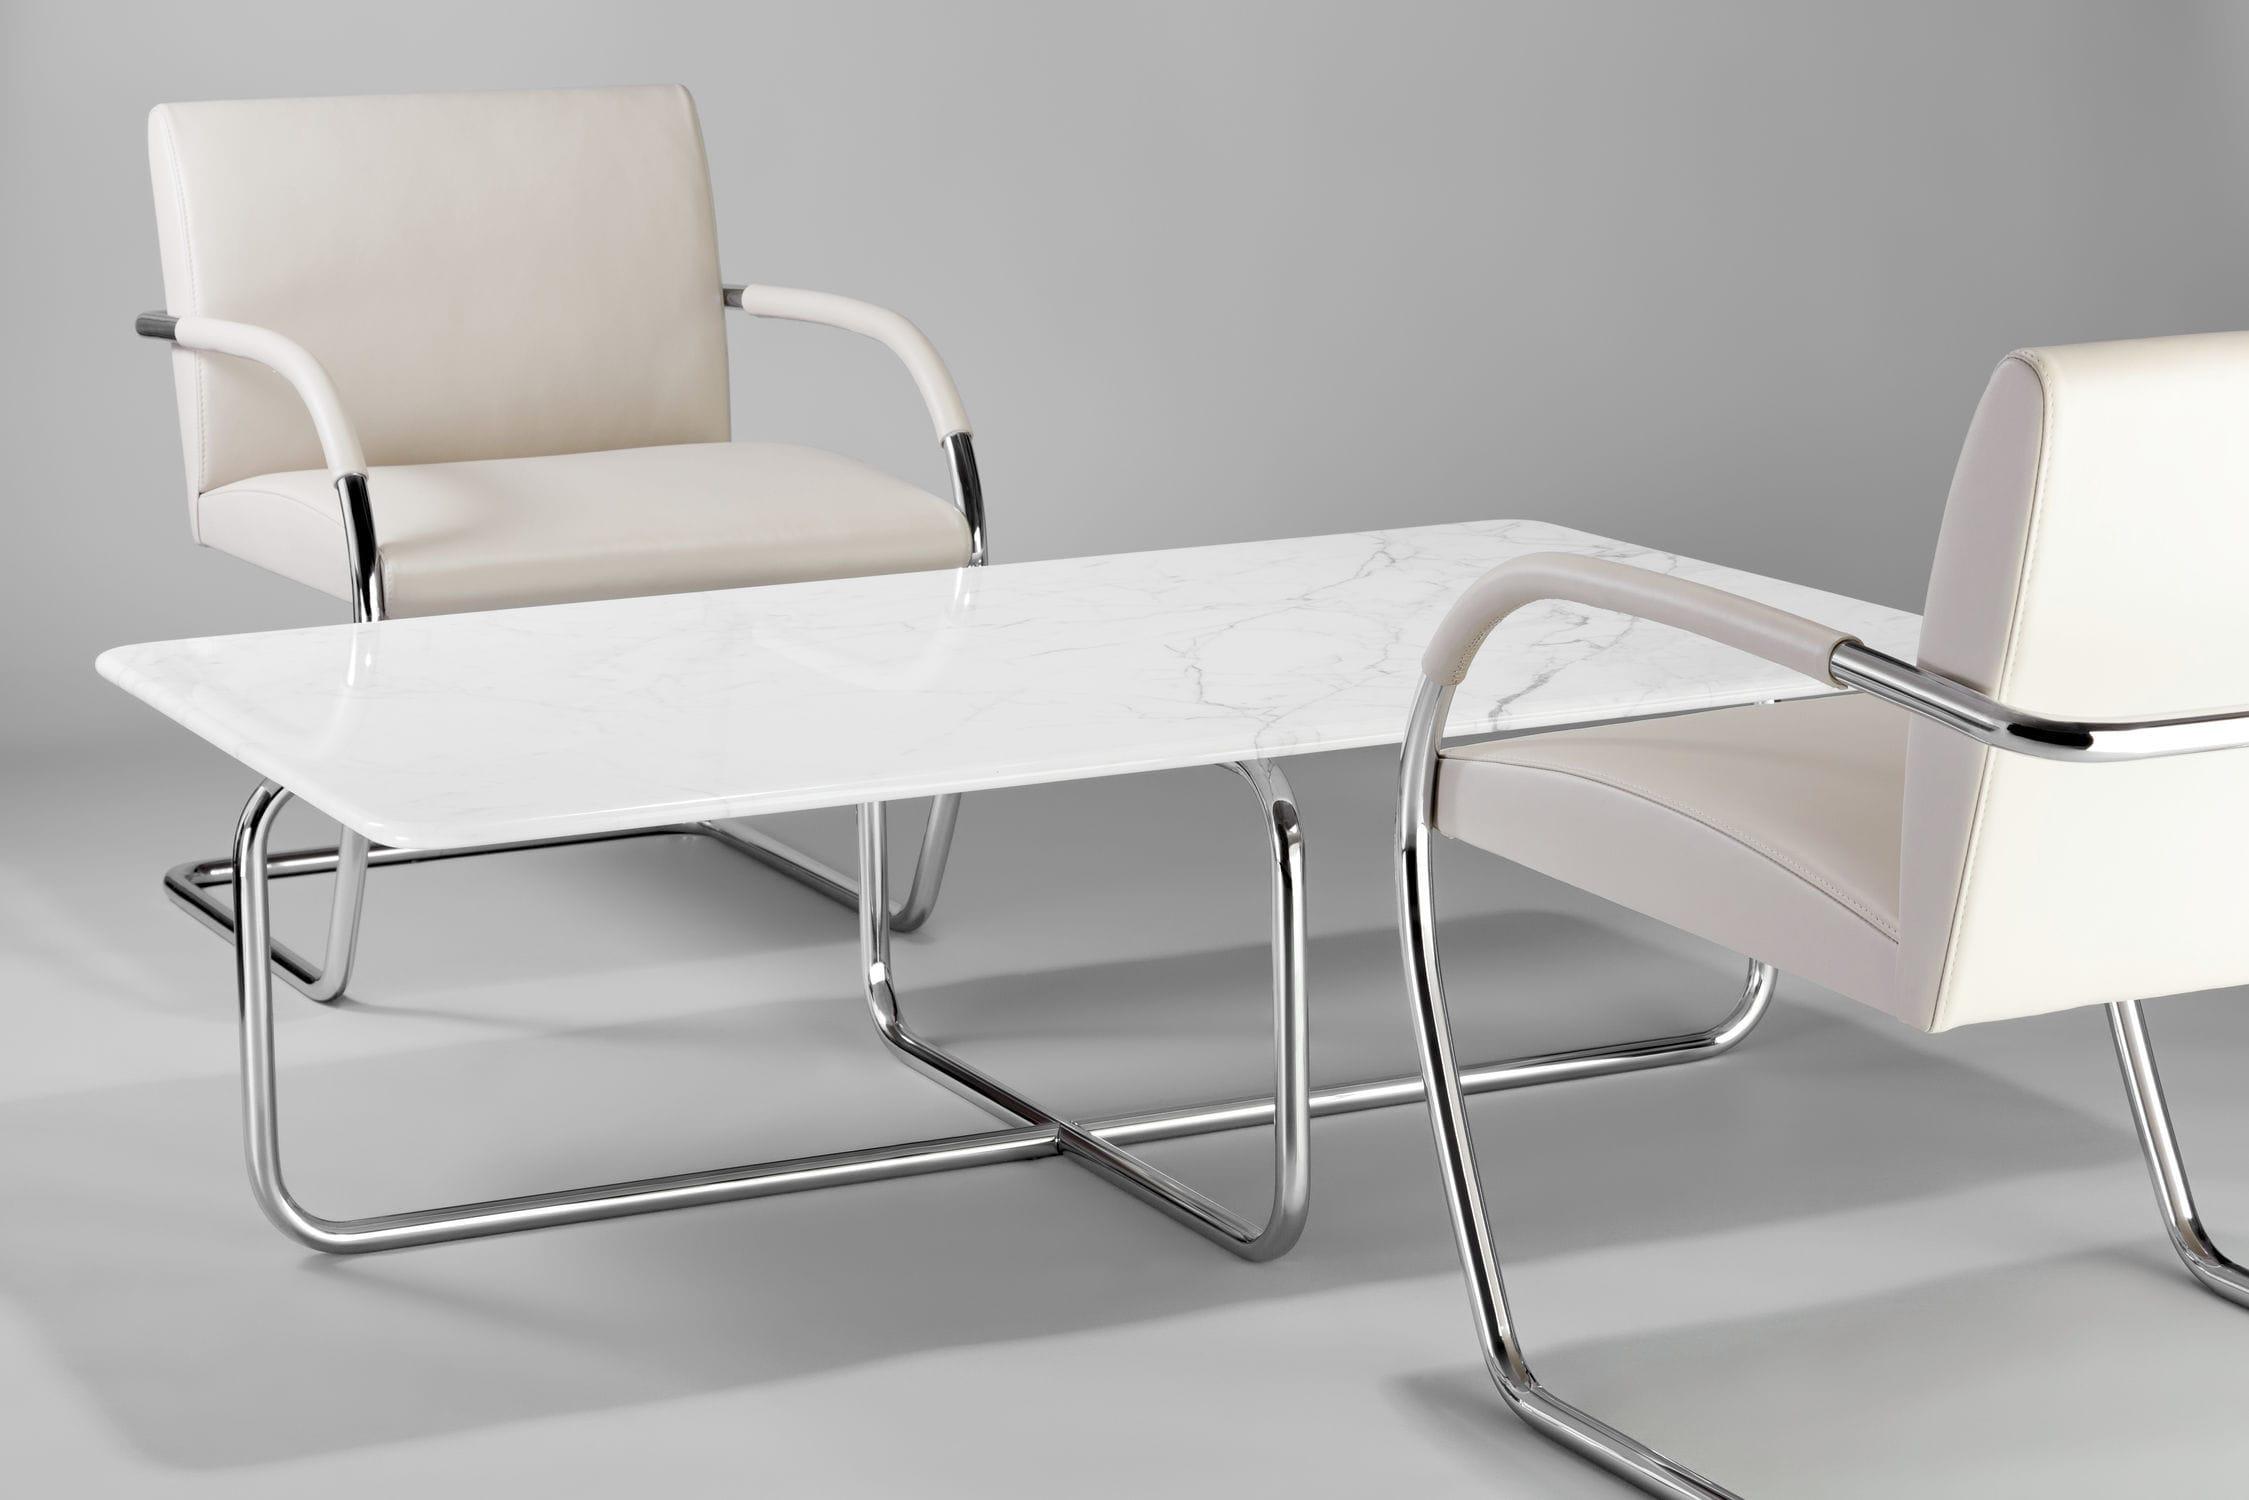 Mesa De Centro De Dise O Bauhaus De M Rmol De Acero De  # Muebles Bauhaus Caracteristicas